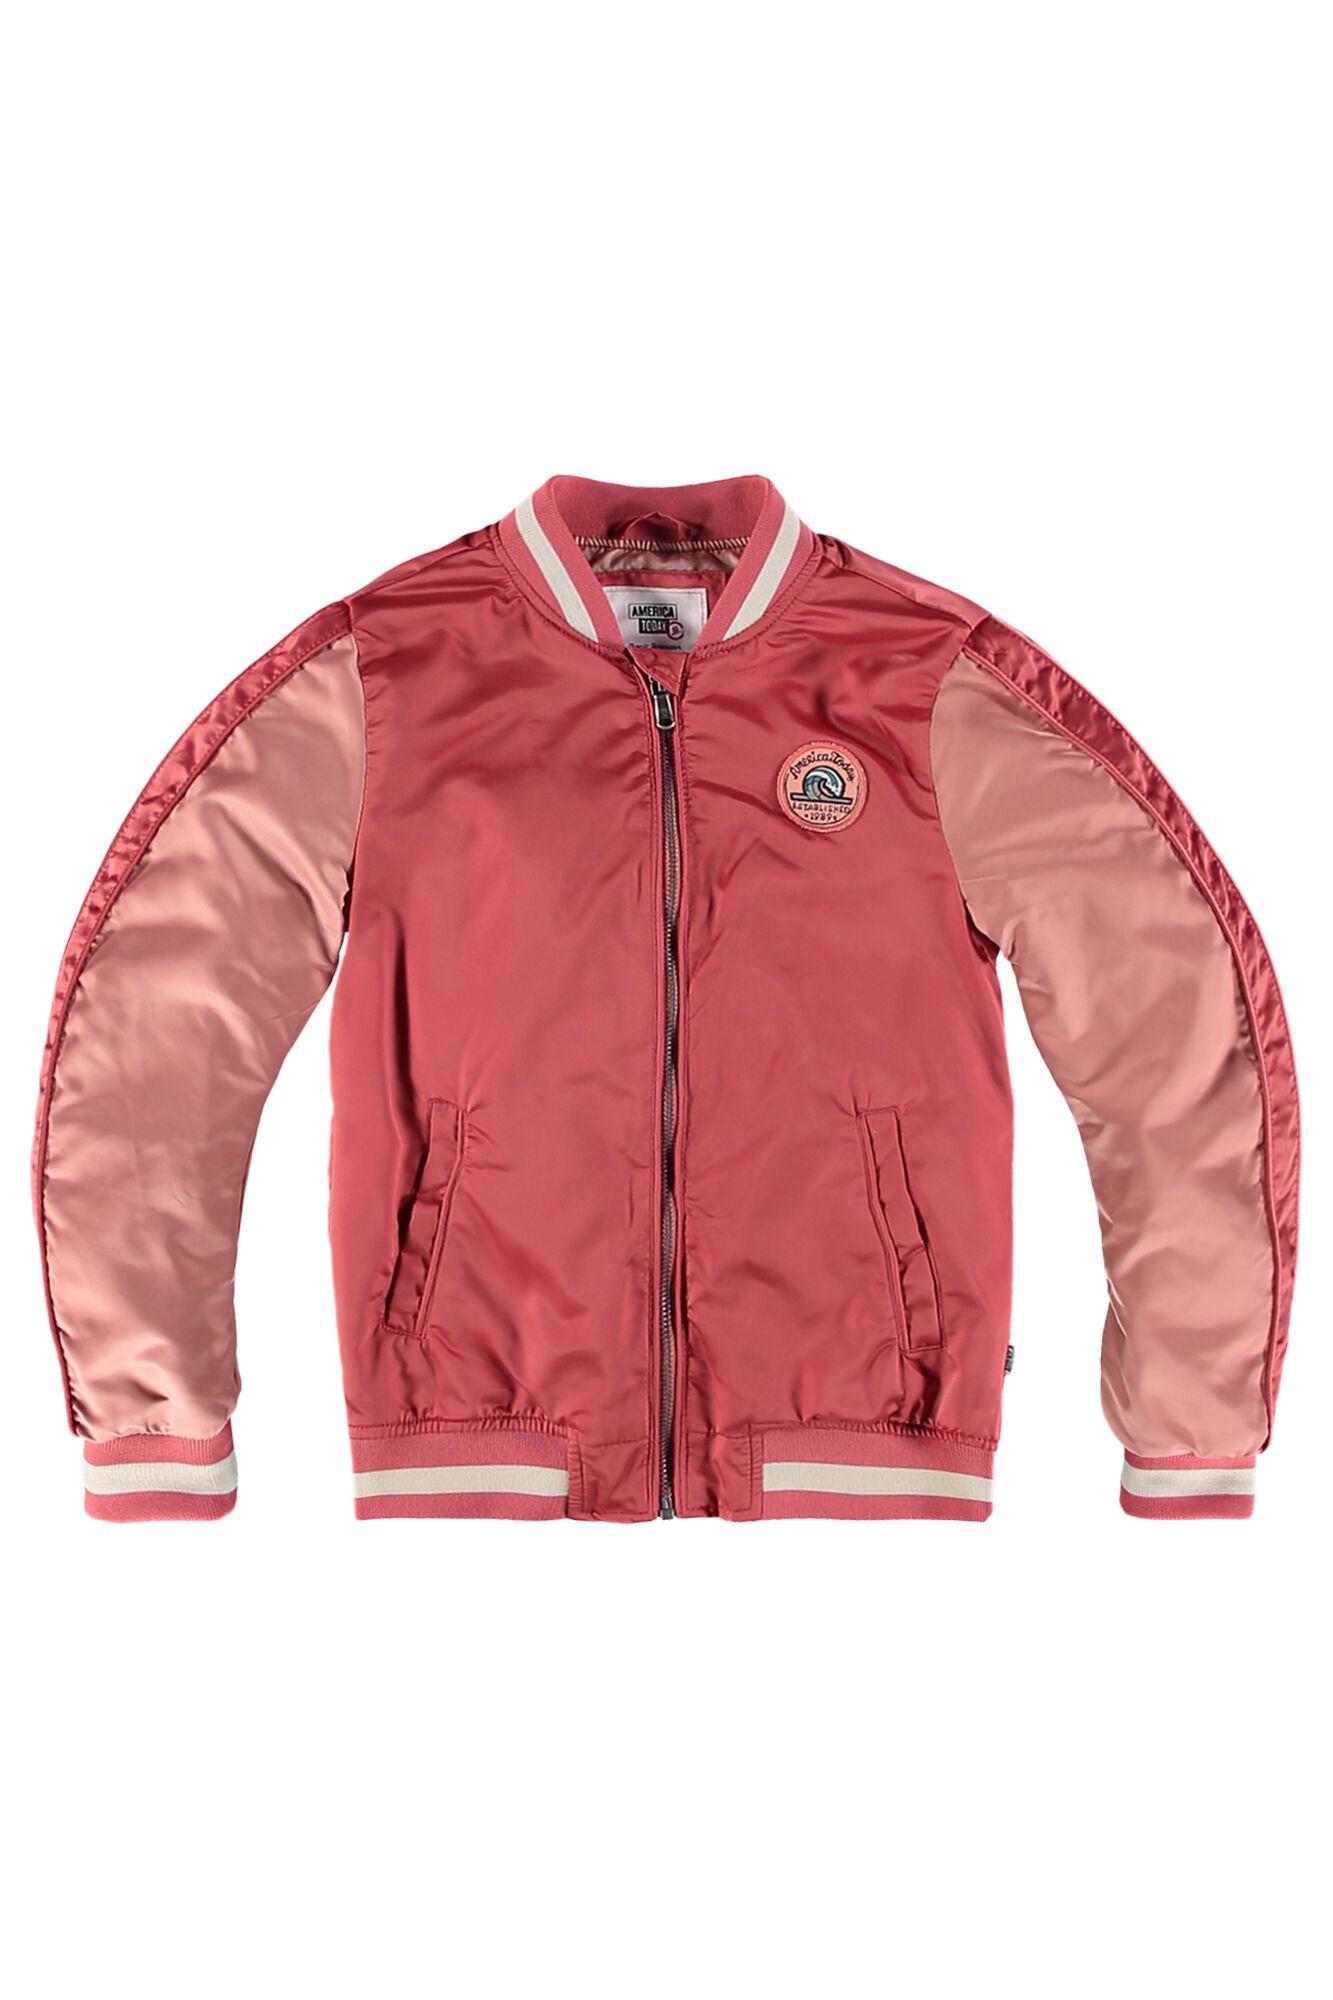 Girls Baseball jacket Juul Pink Buy Online